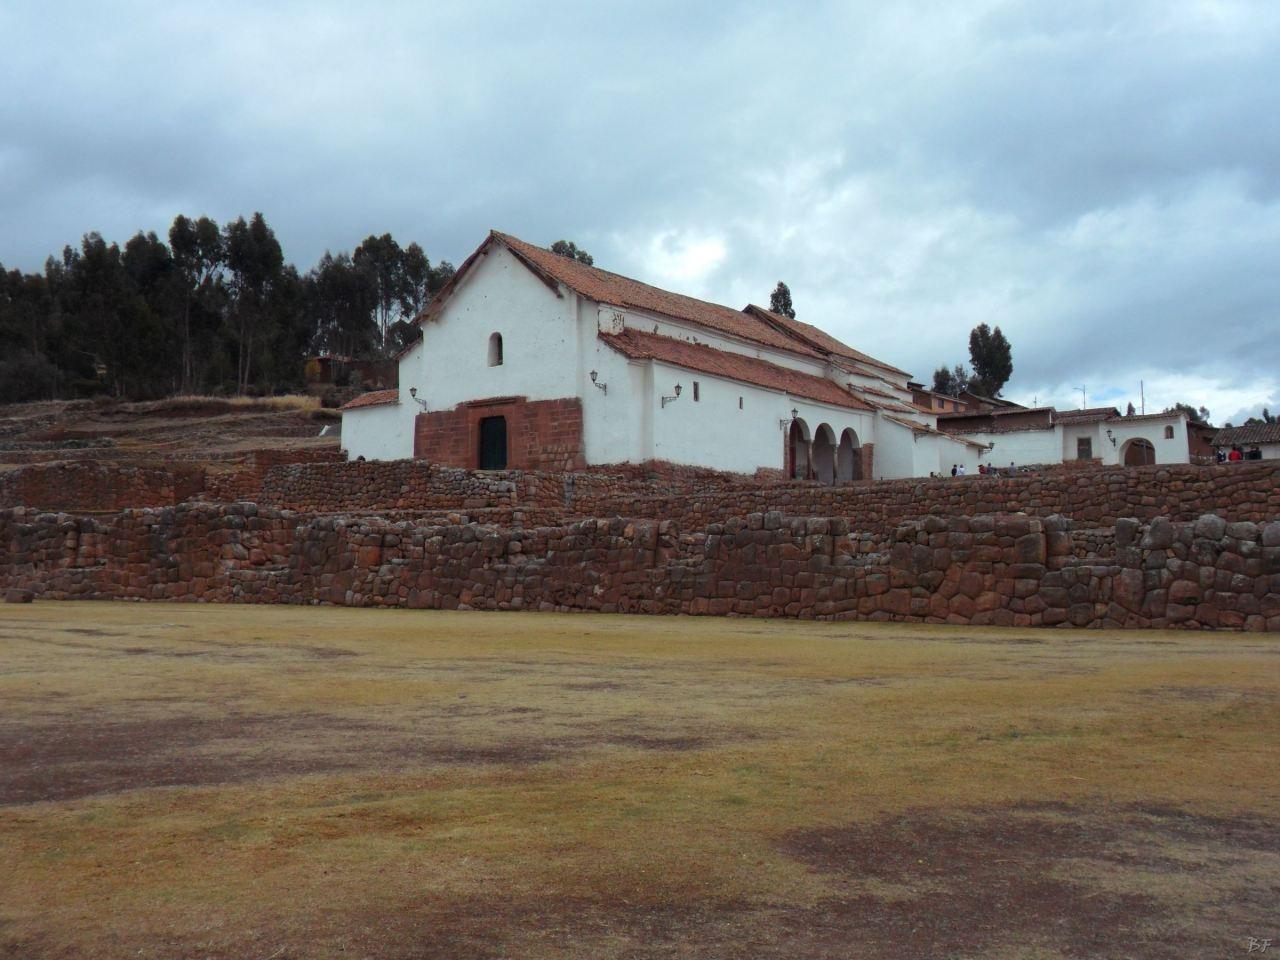 Chinchero-Mura-Poligonali-Piramide-Urubamba-Peru-29